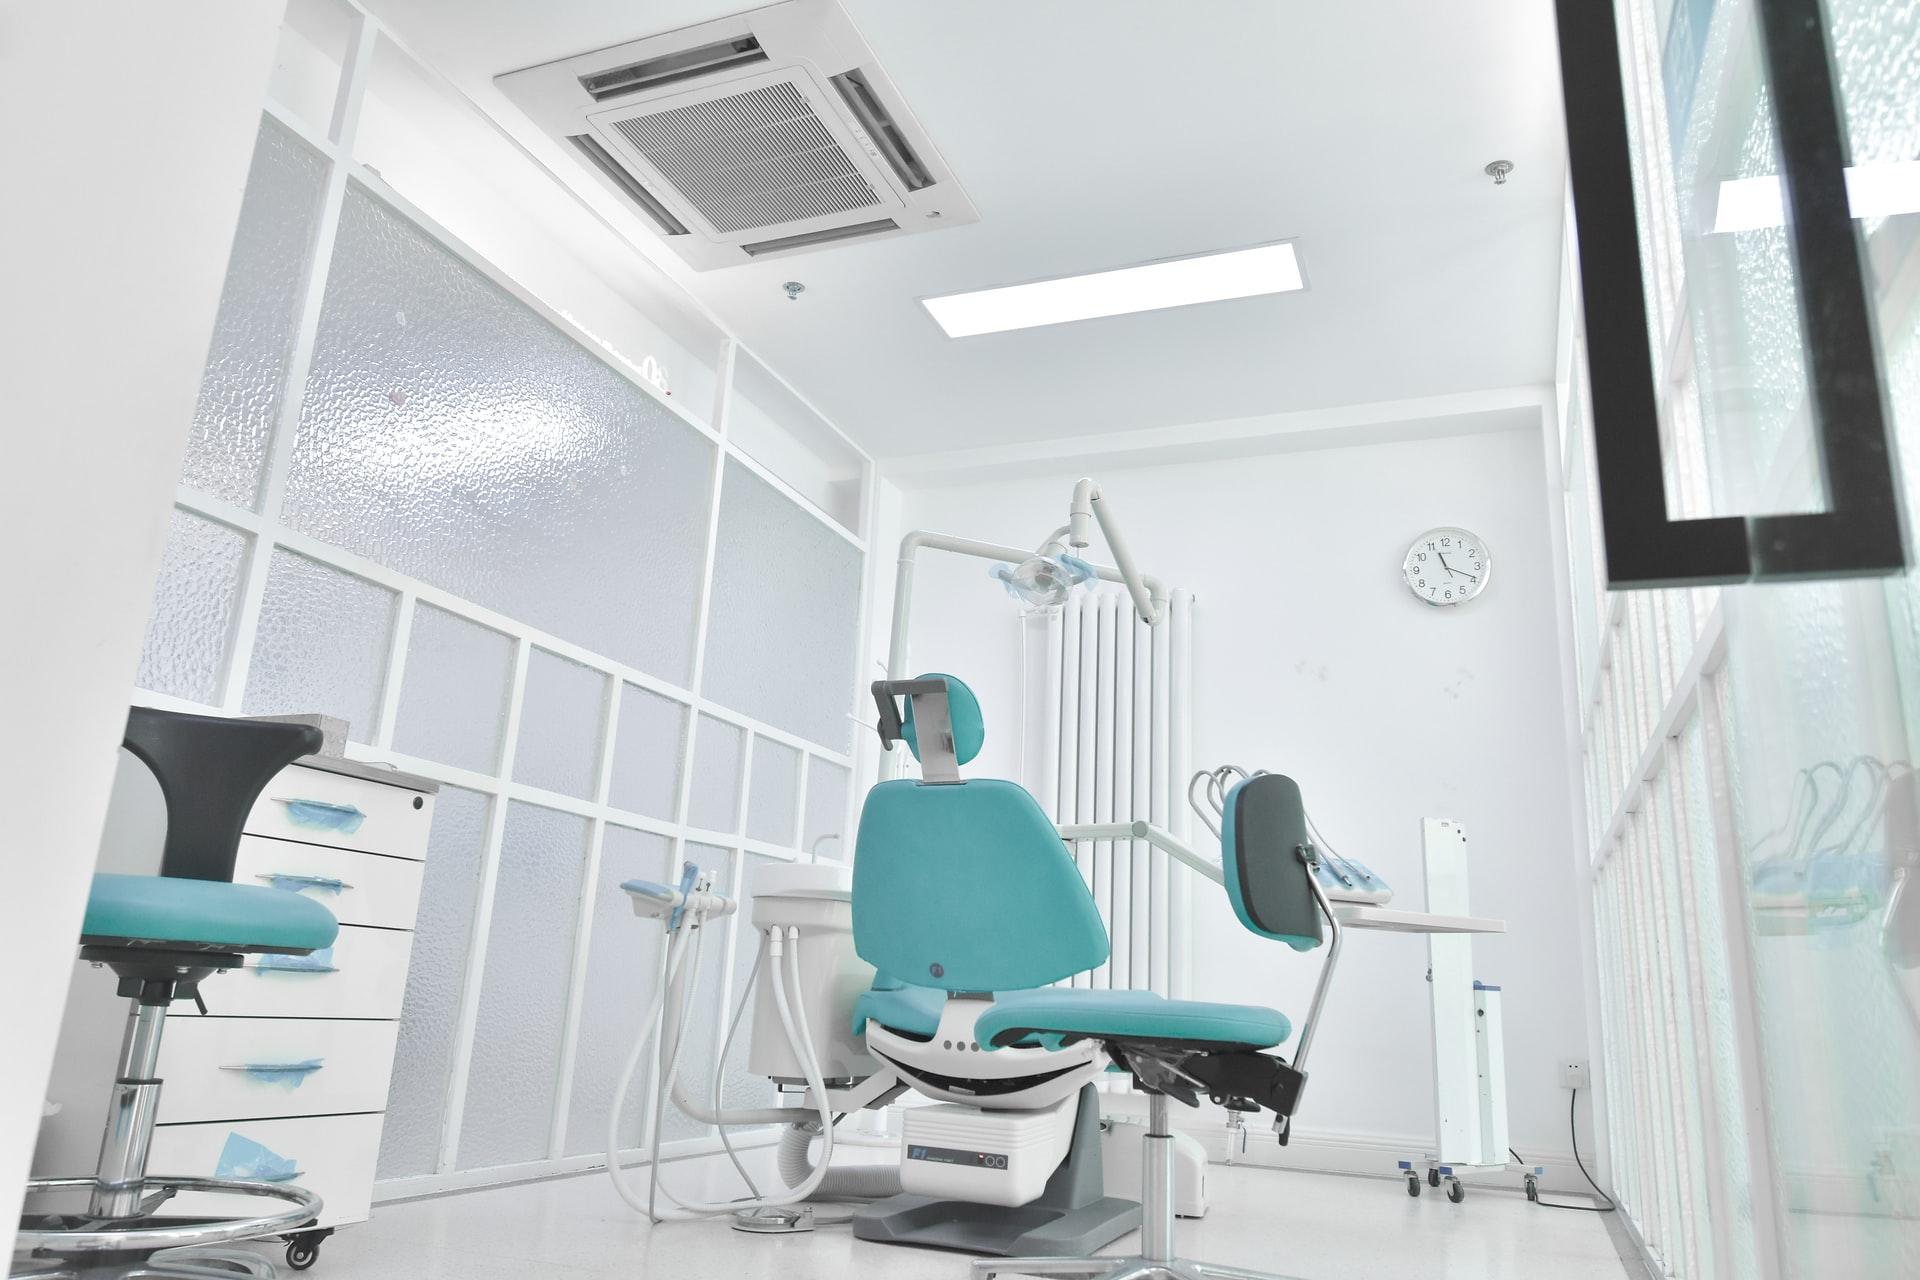 Ilustrasi ruang perawatan di klinik dokter gigi. (H Shaw on Unsplash)